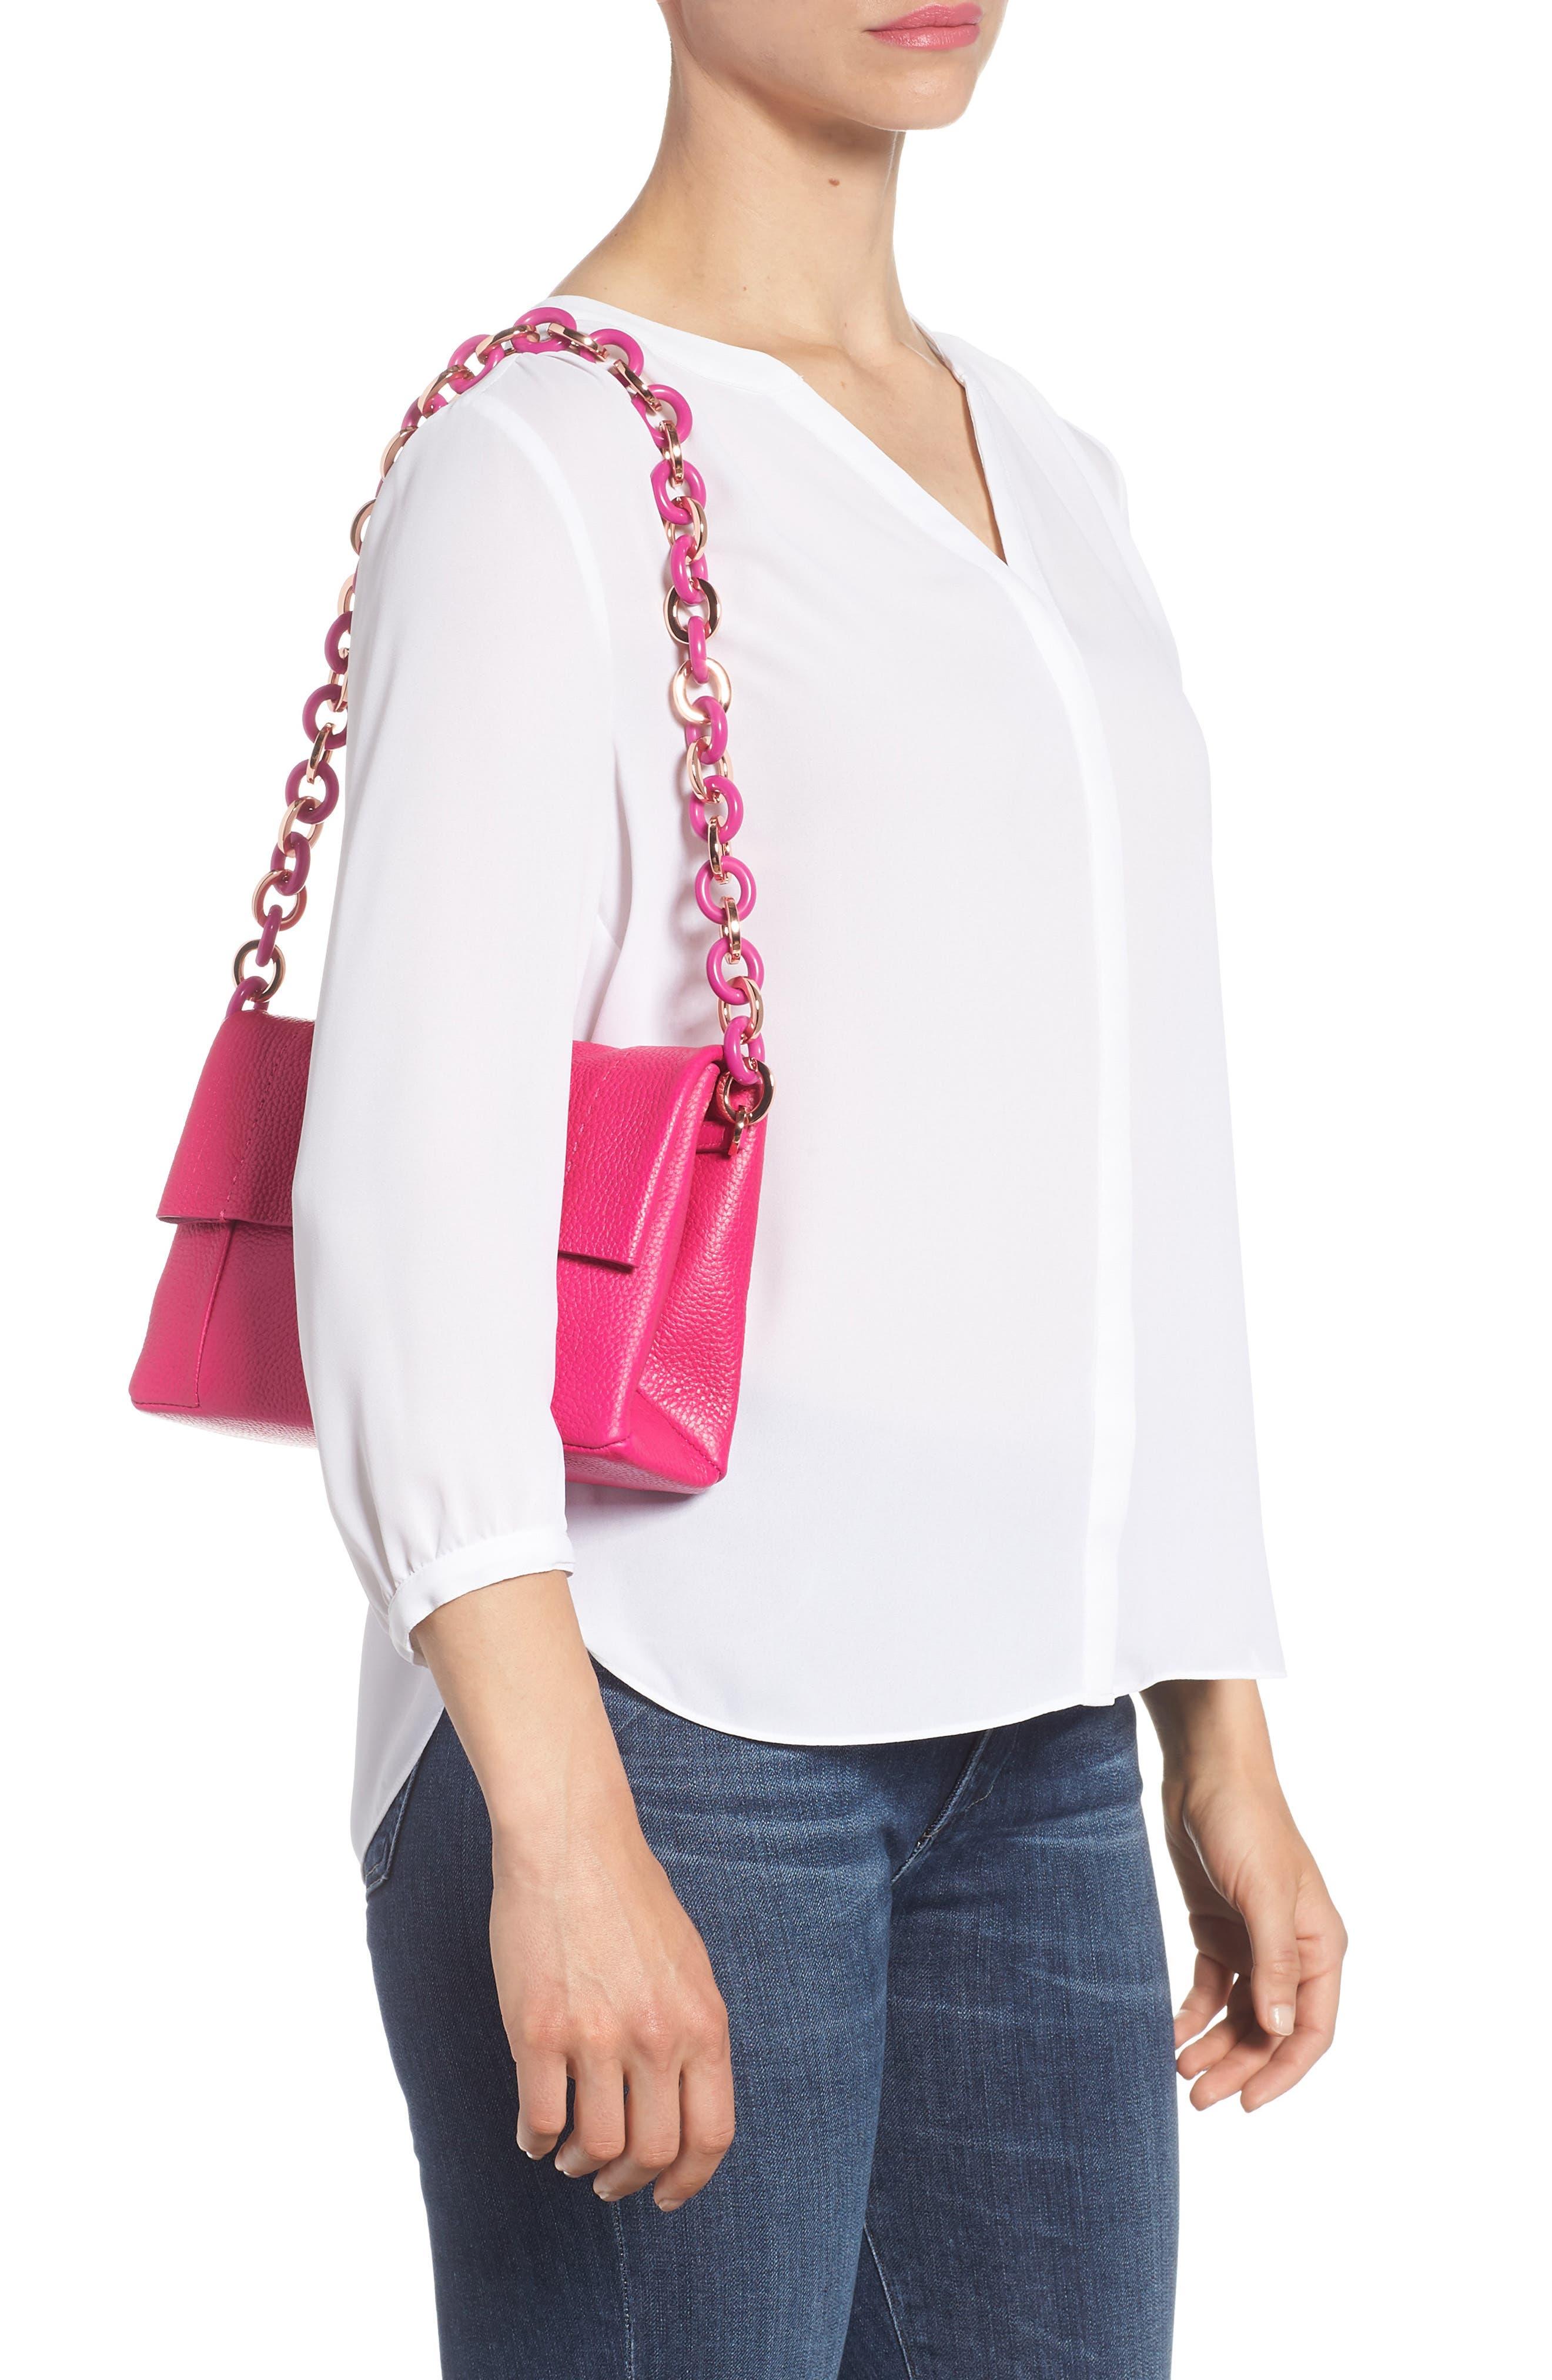 Ipomoea Leather Shoulder Bag,                             Alternate thumbnail 6, color,